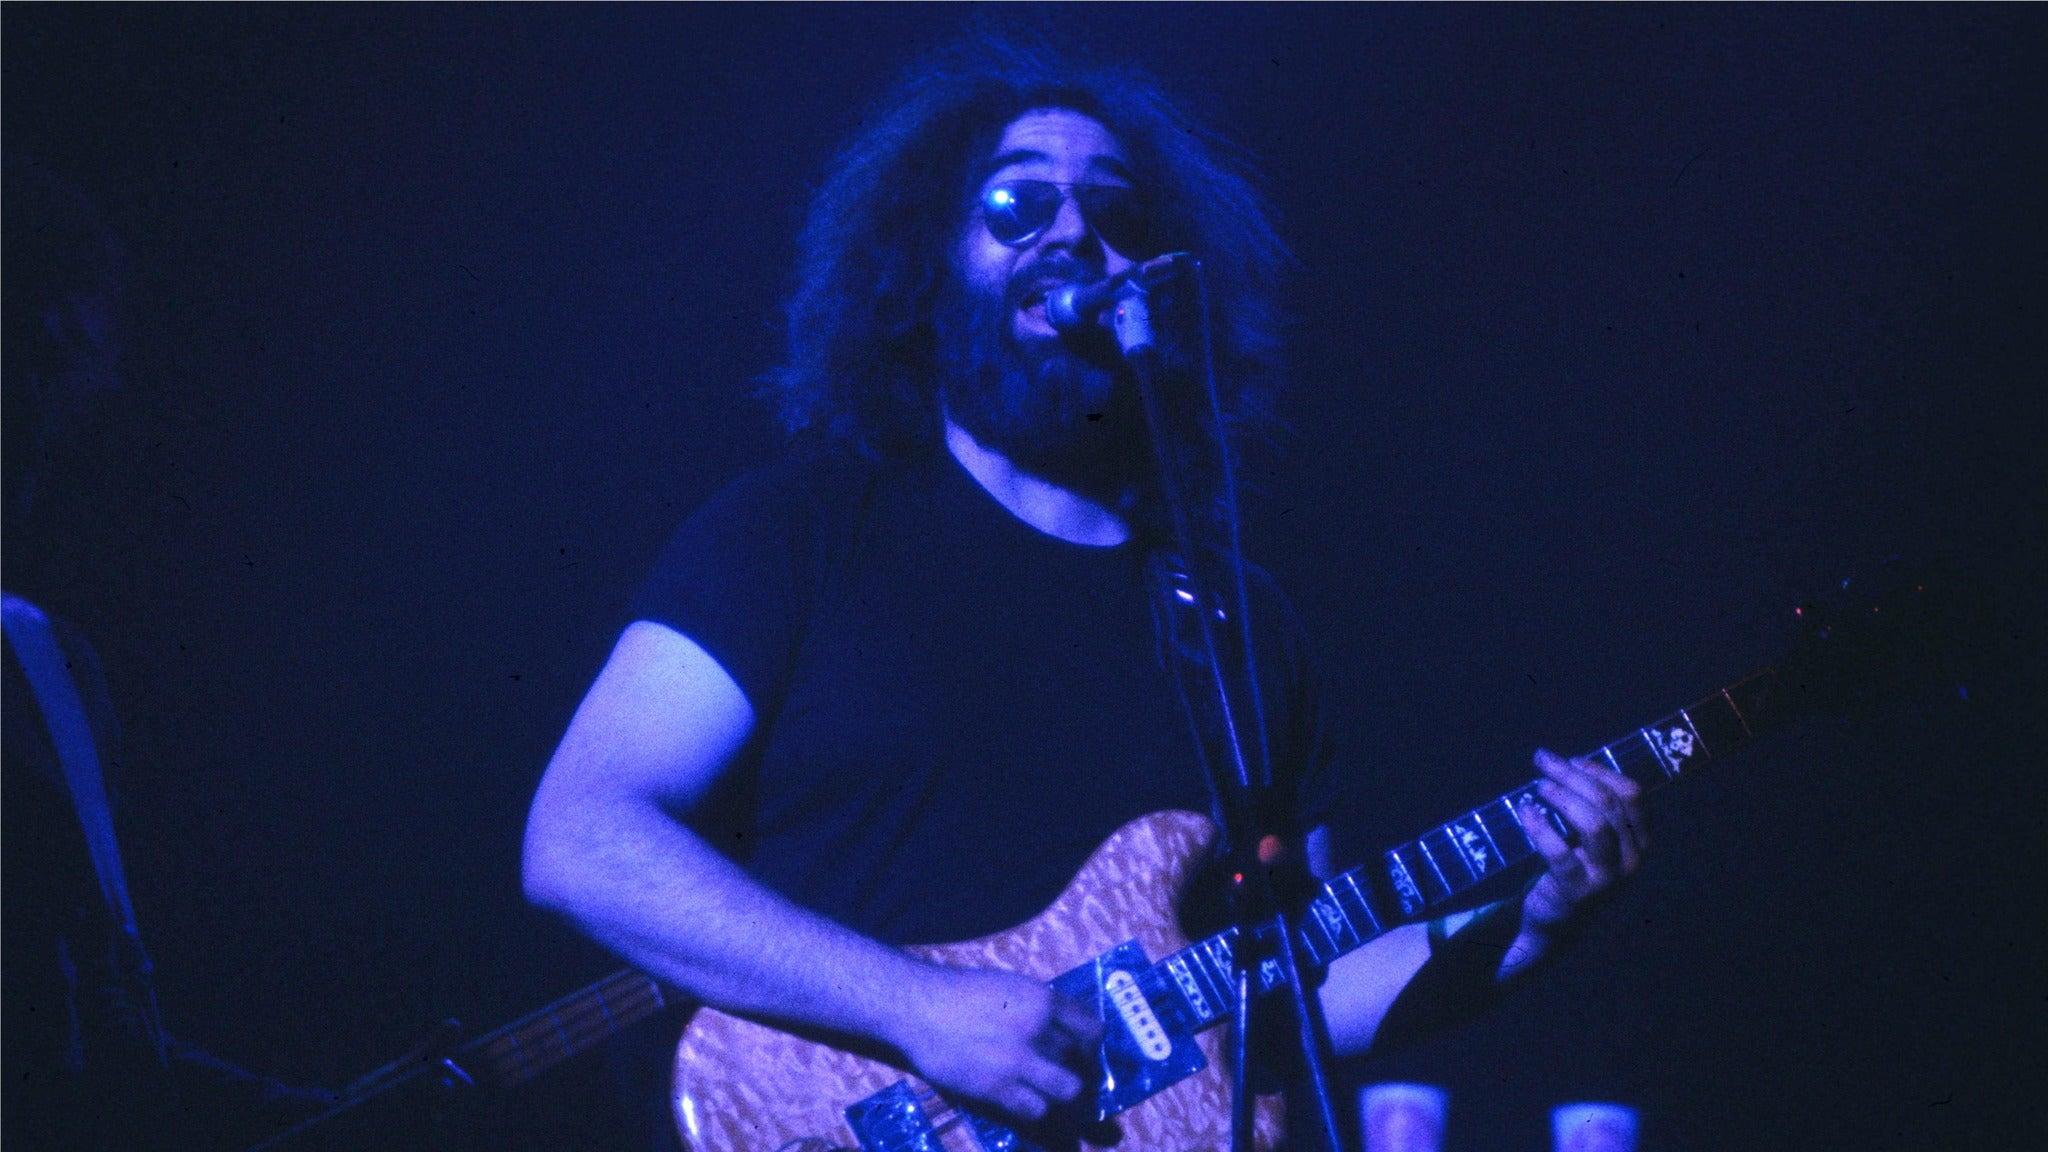 Mike Cano & Jerry Garcia at Brea Improv